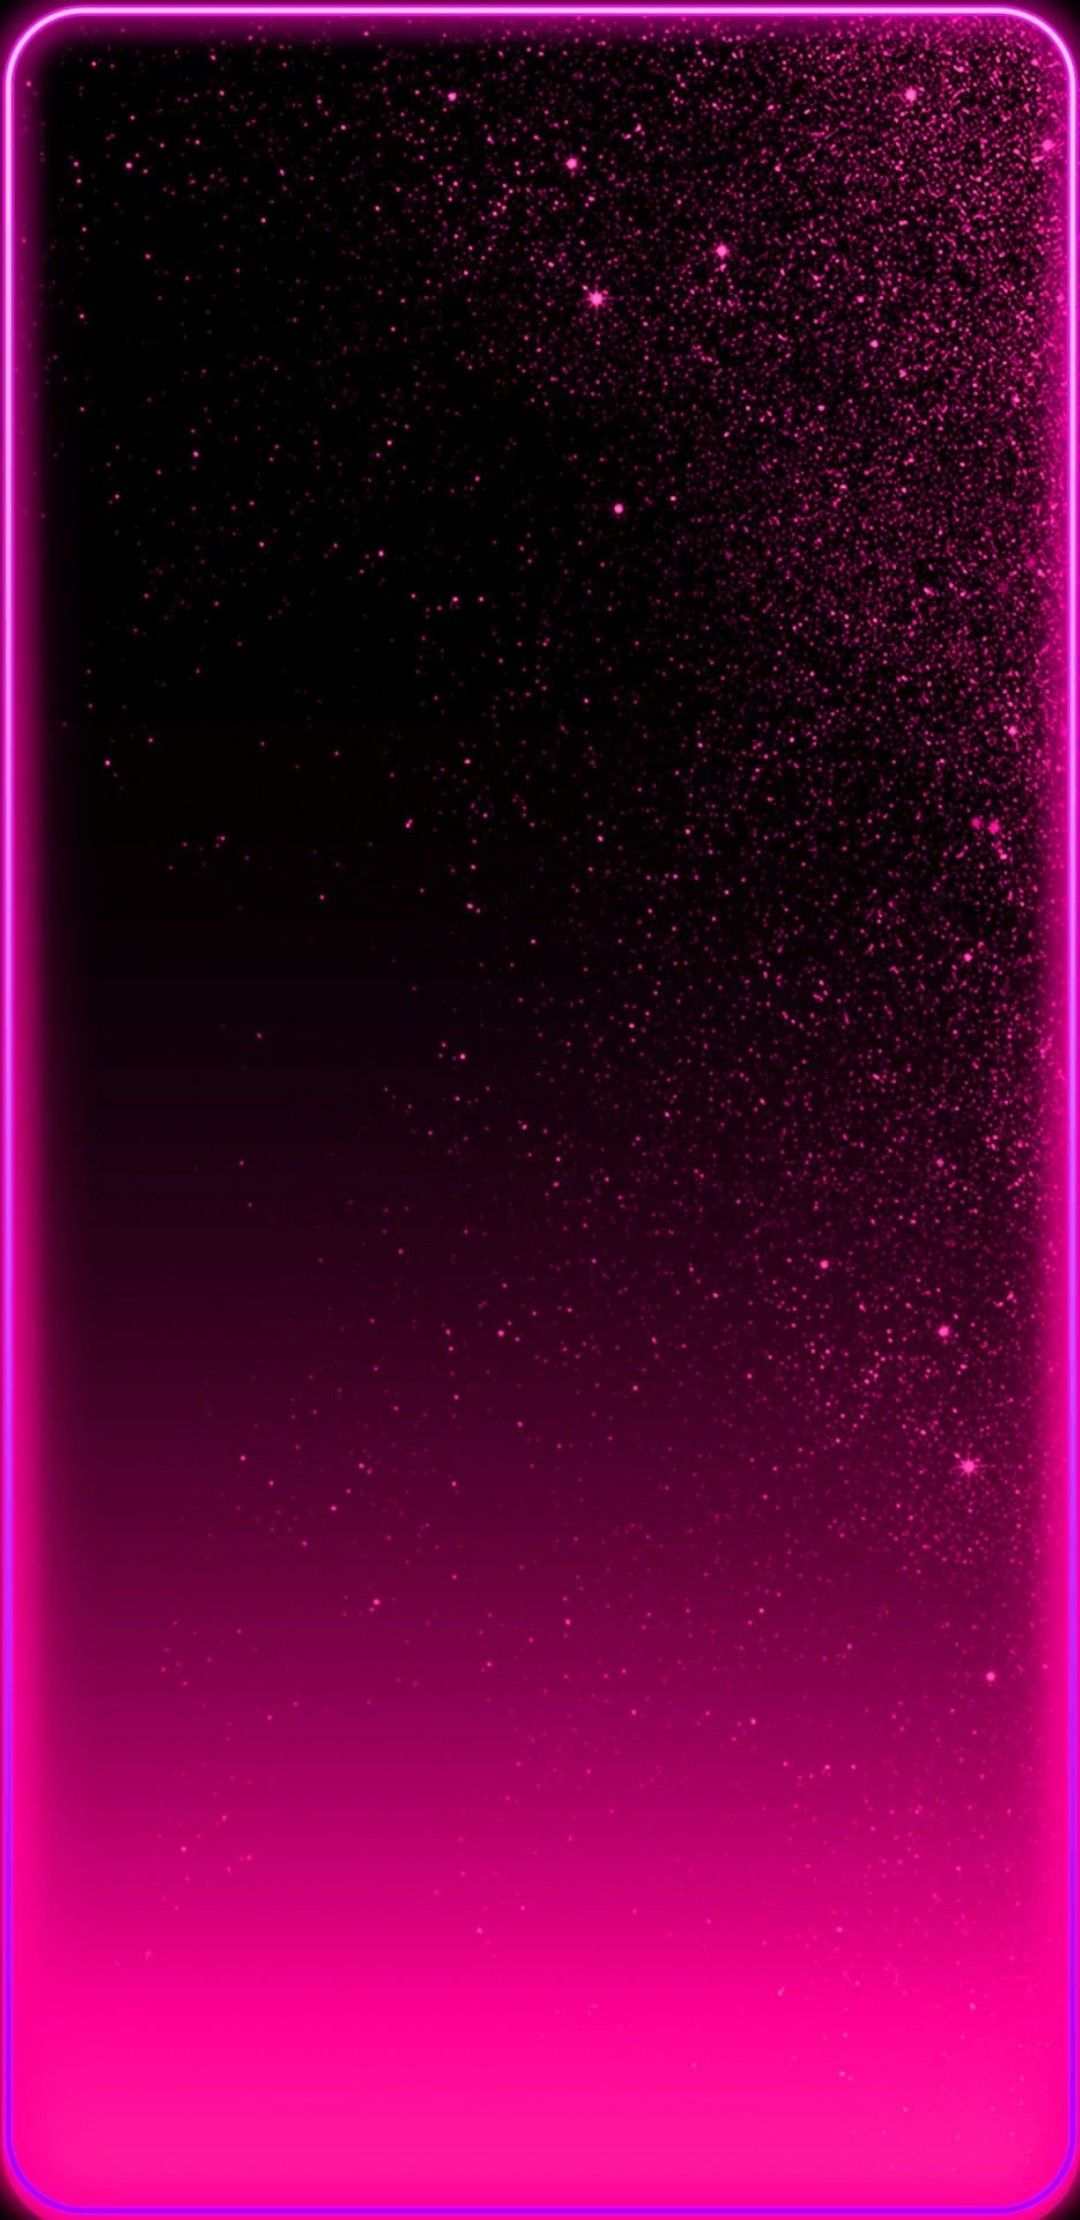 Hot Pink Pink Wallpaper Iphone Pink Neon Wallpaper Pink Wallpaper Backgrounds